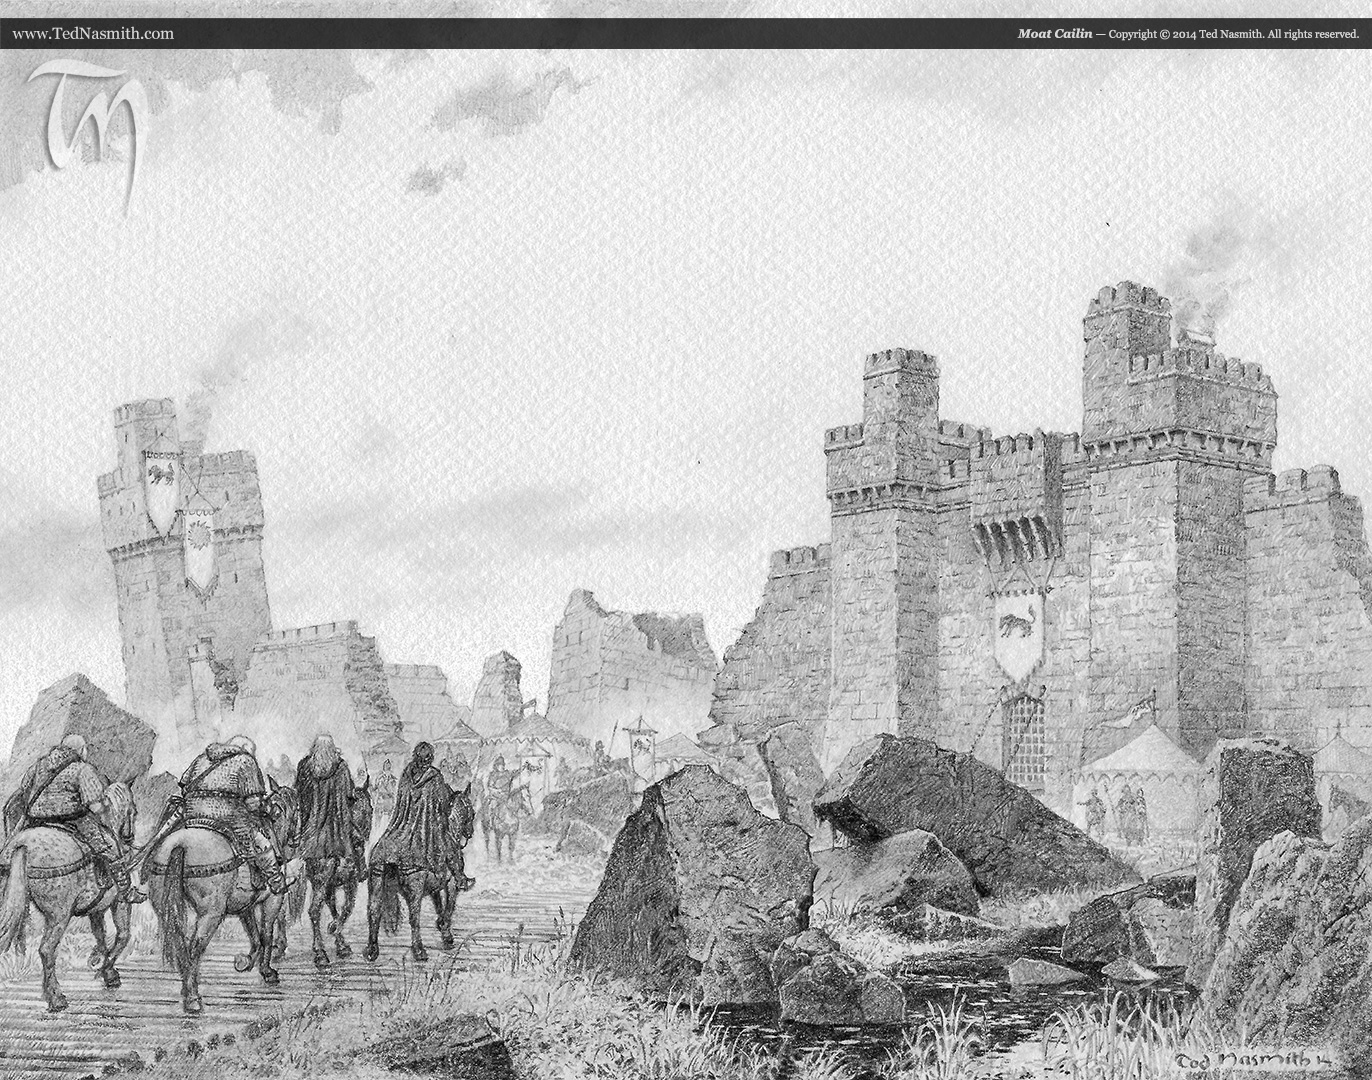 A Game of Thrones - Kapitel 55 - Catelyn VIII